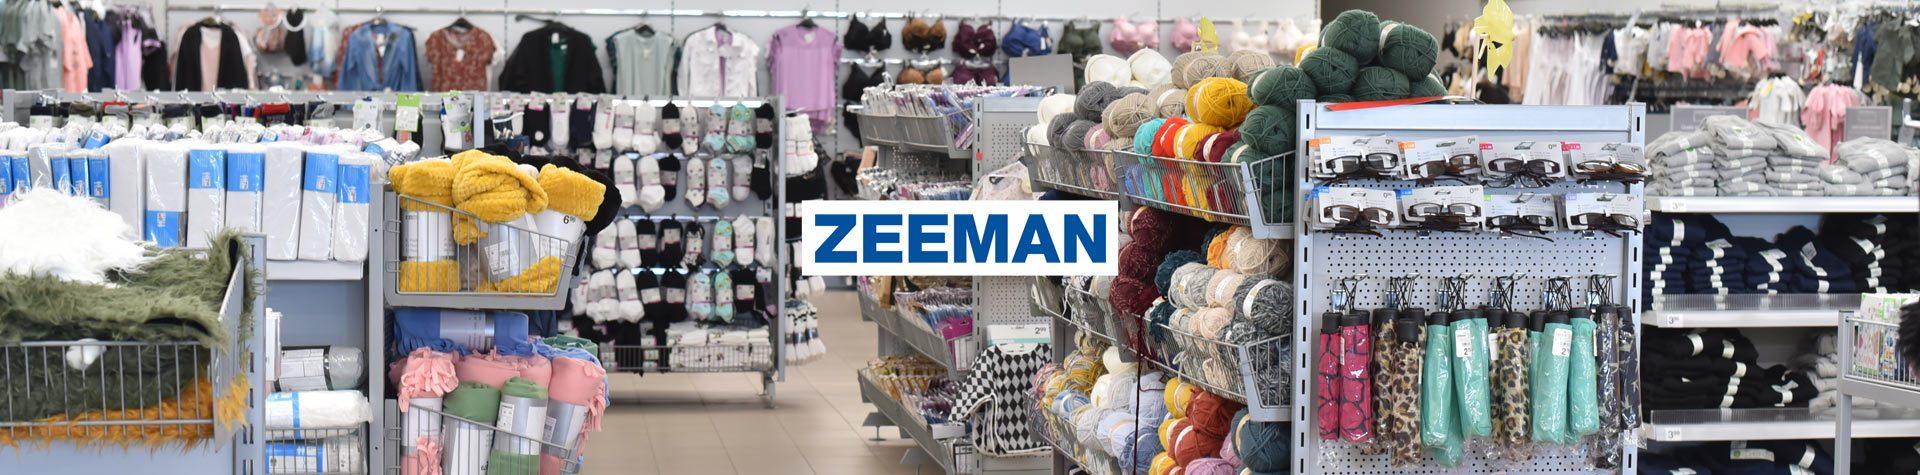 Photo bannière avec logo zeeman